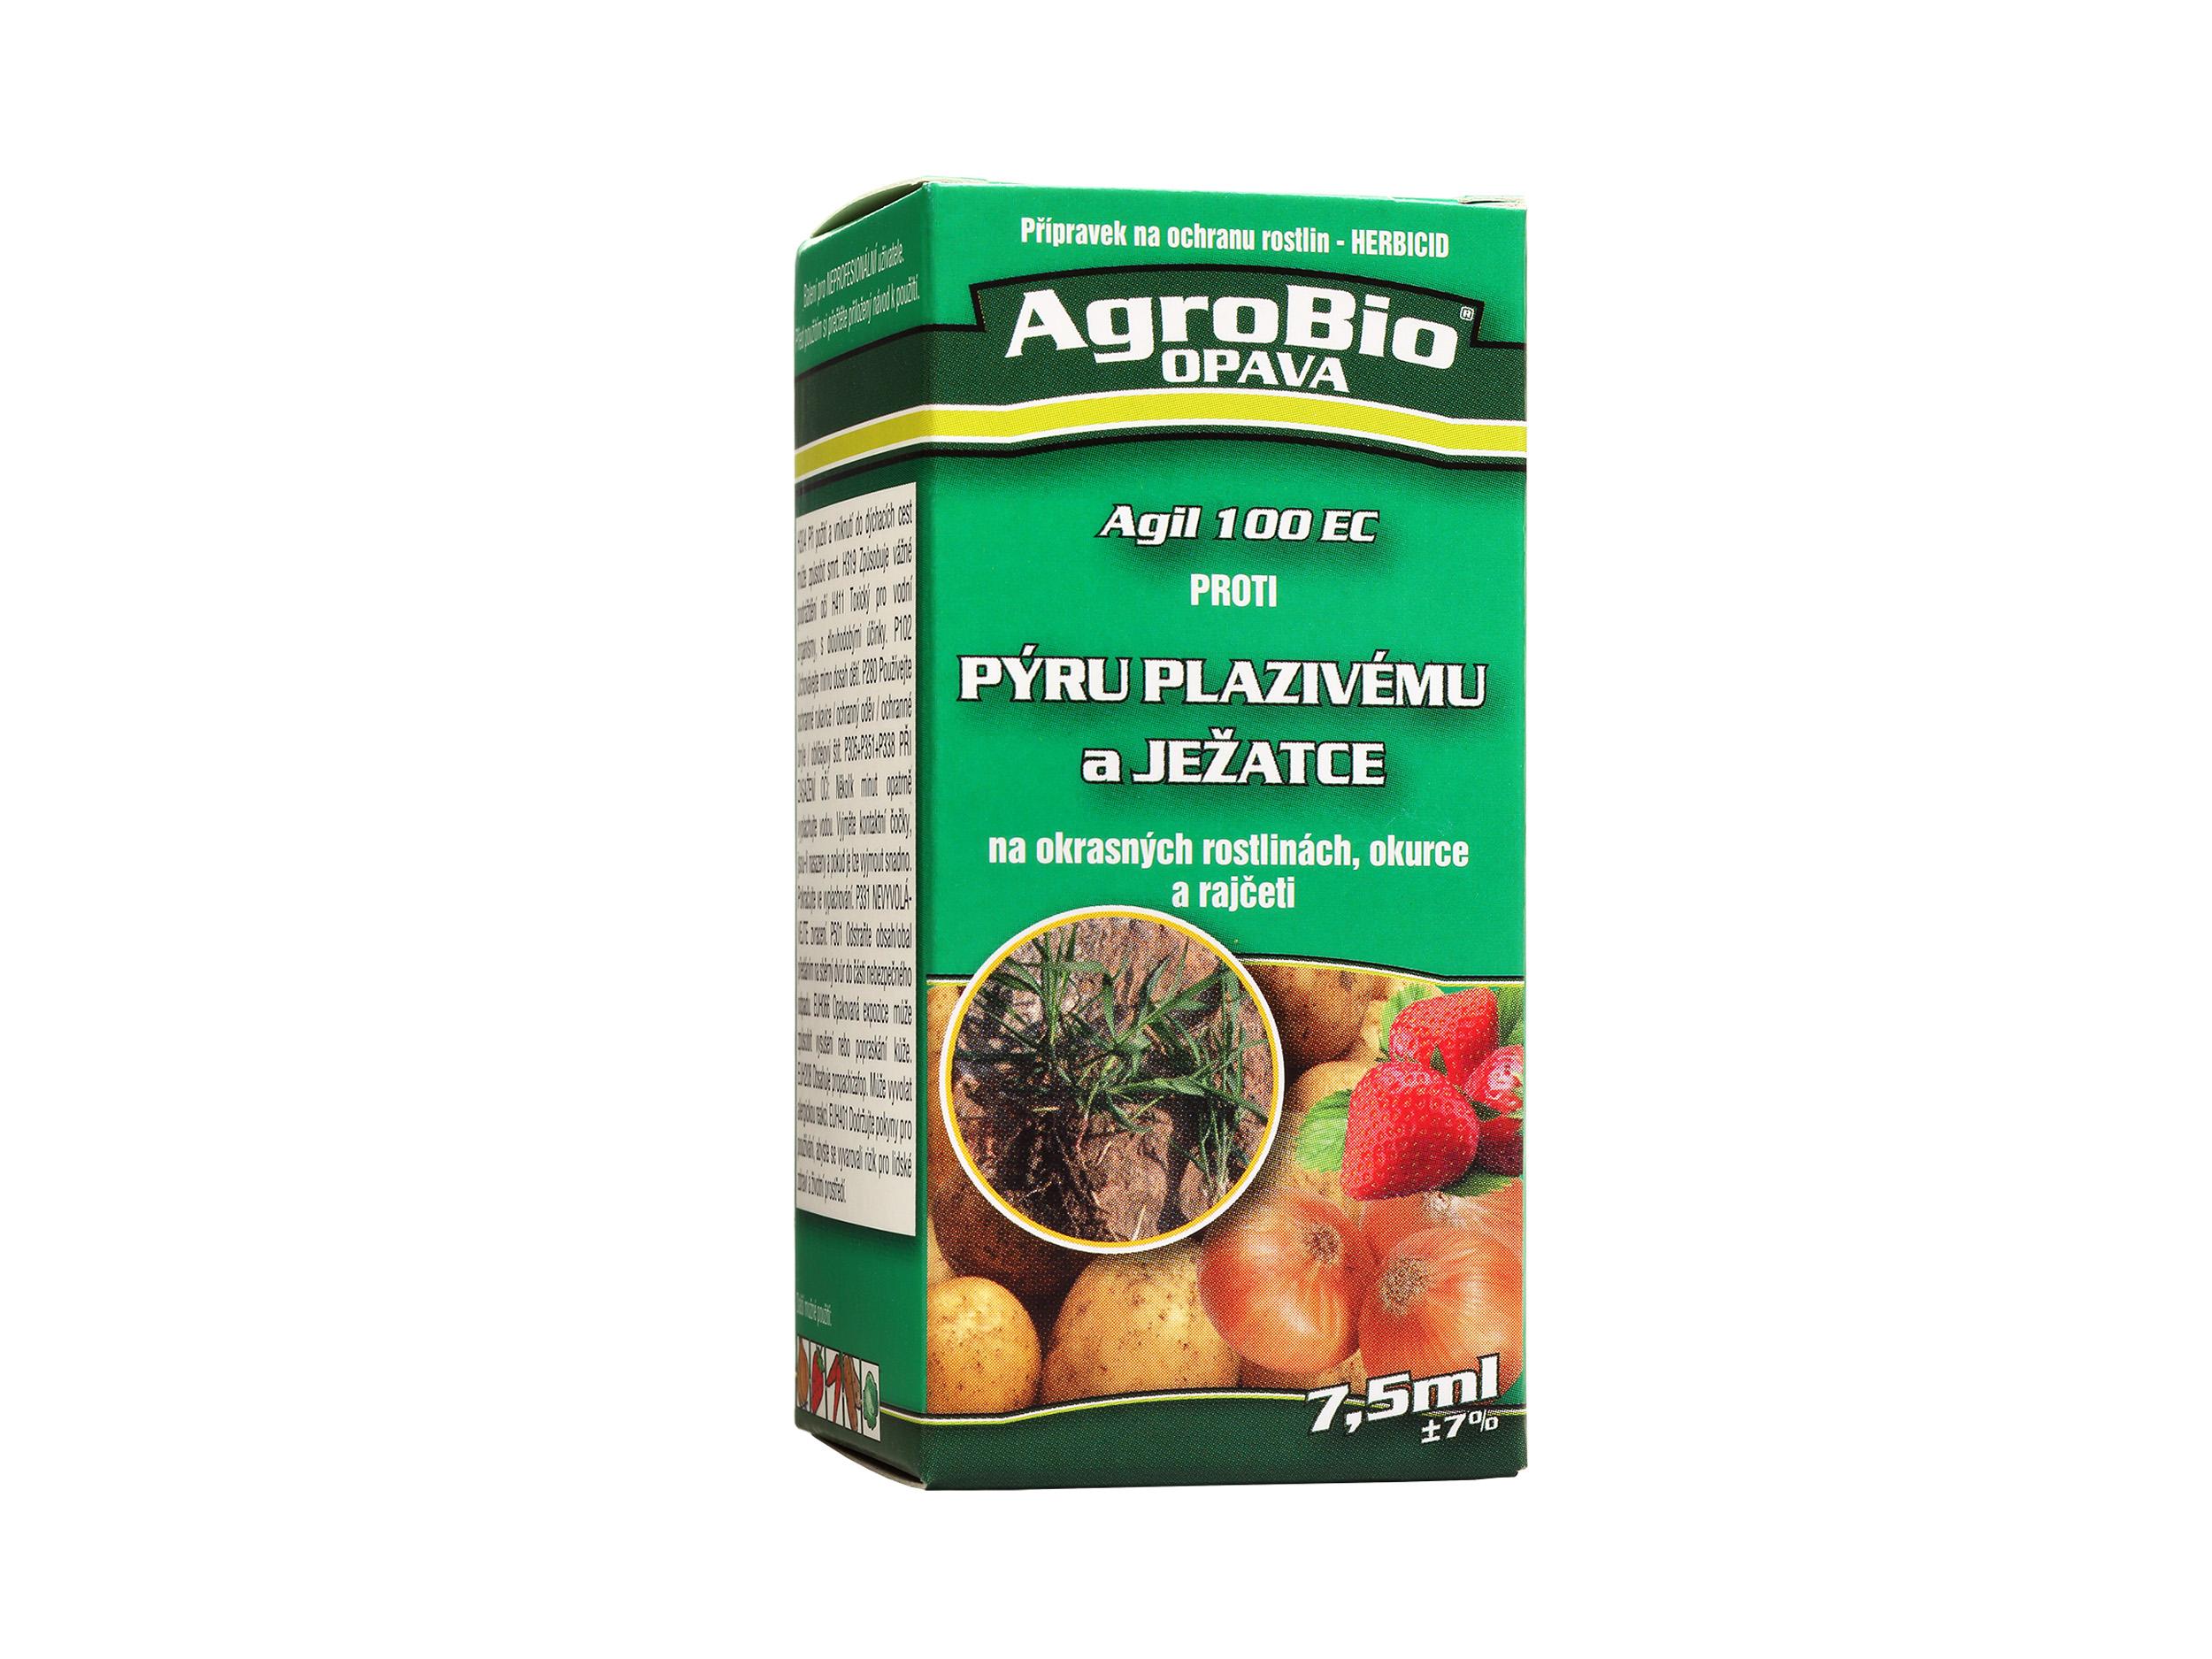 Proti pýru a ježatce (Agil)